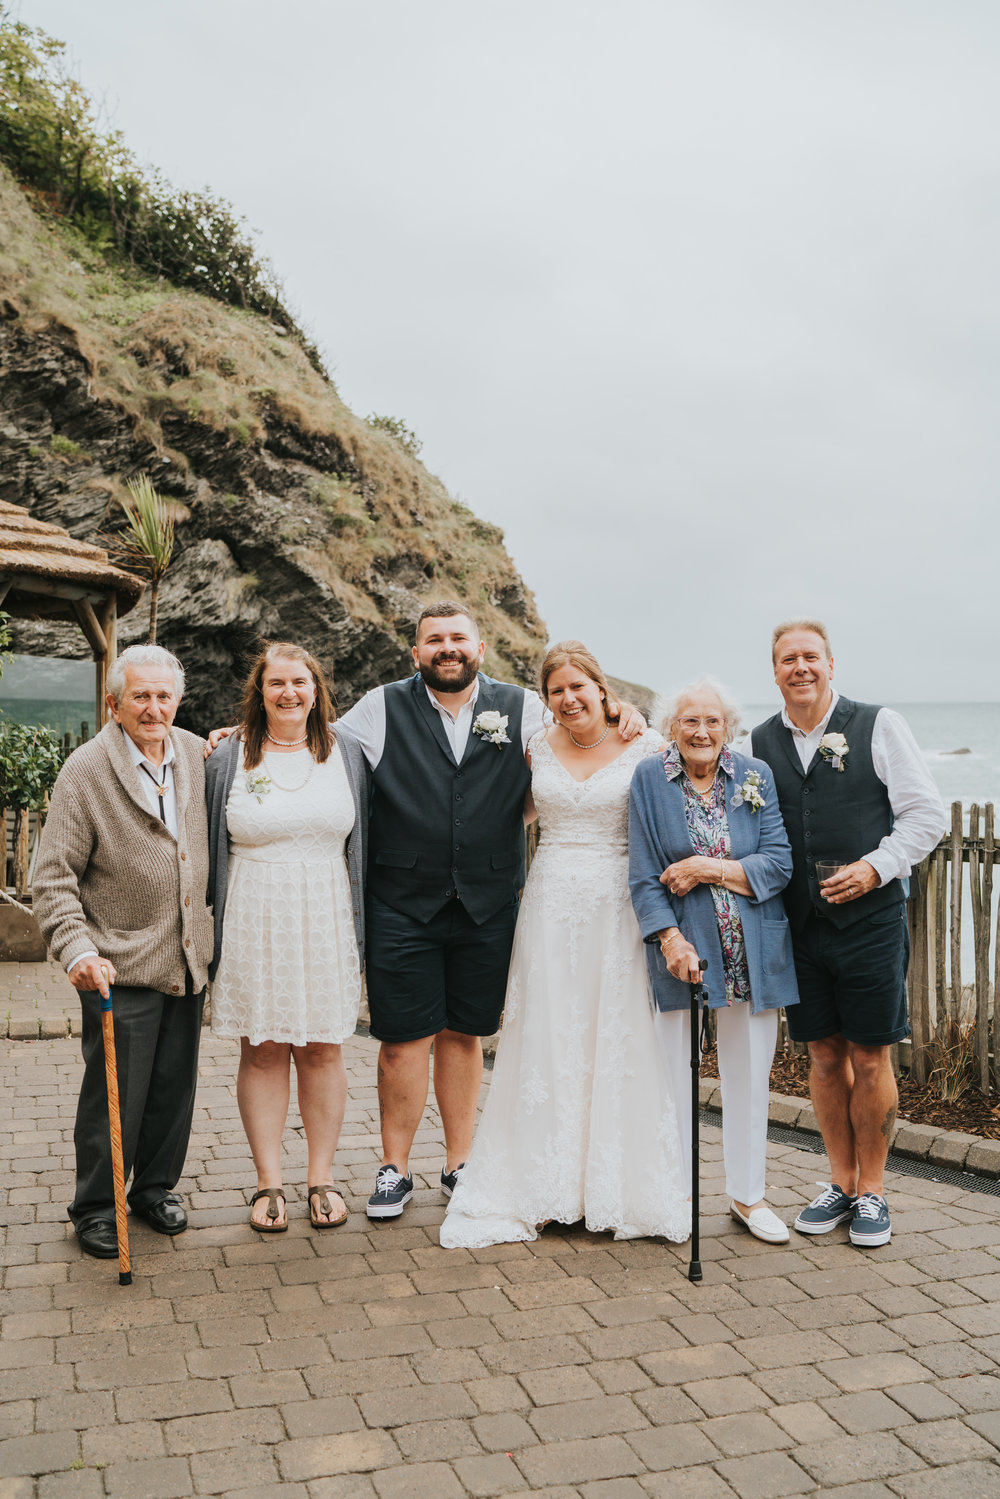 john-amy-relaxed-beach-wedding-tunnels-beaches-ilfracombe-north-devon-grace-elizabeth-colchester-essex-alternative-relaxed-wedding-photography-devon-suffolk-norfolk-essex (128 of 159).jpg